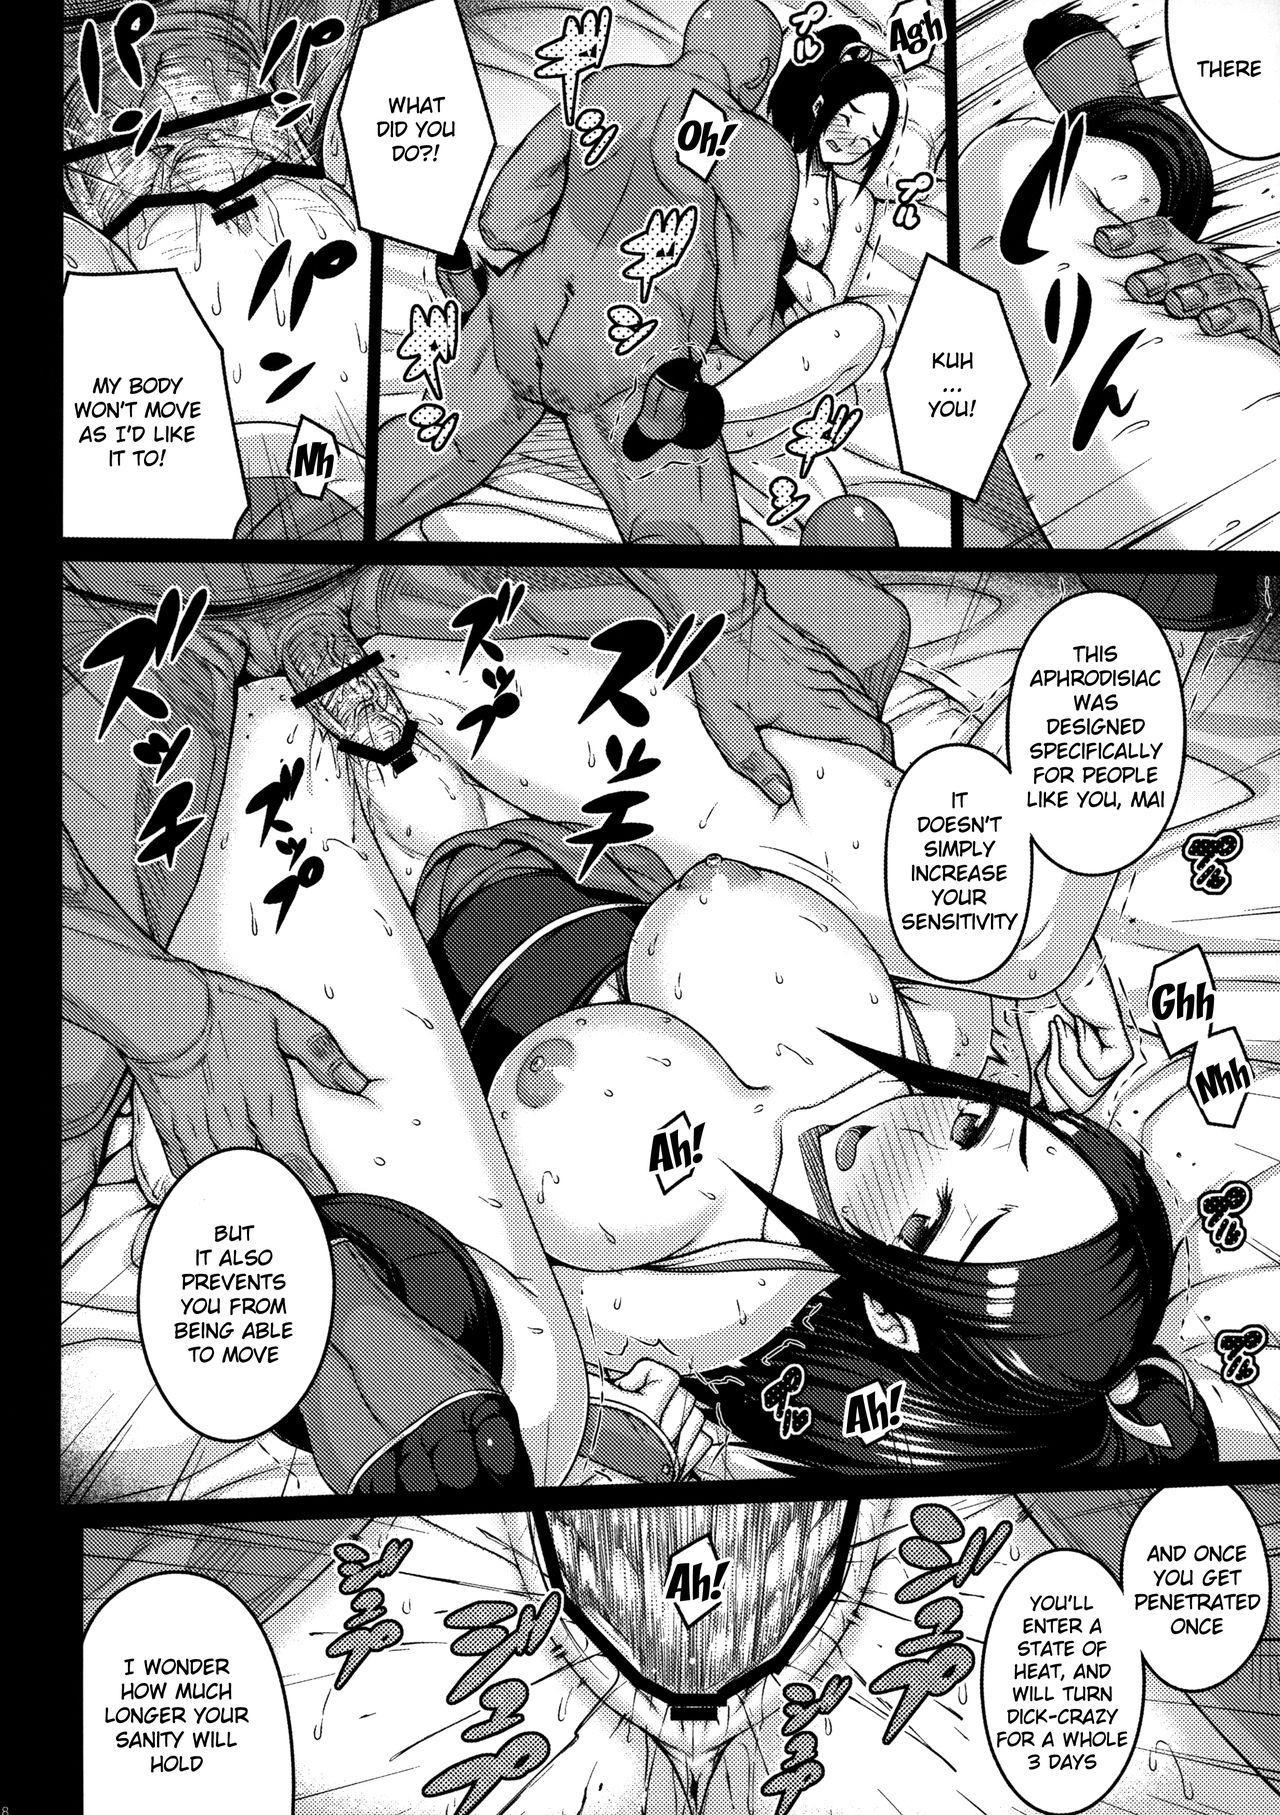 Daraku no hana   Flower of depravity 16